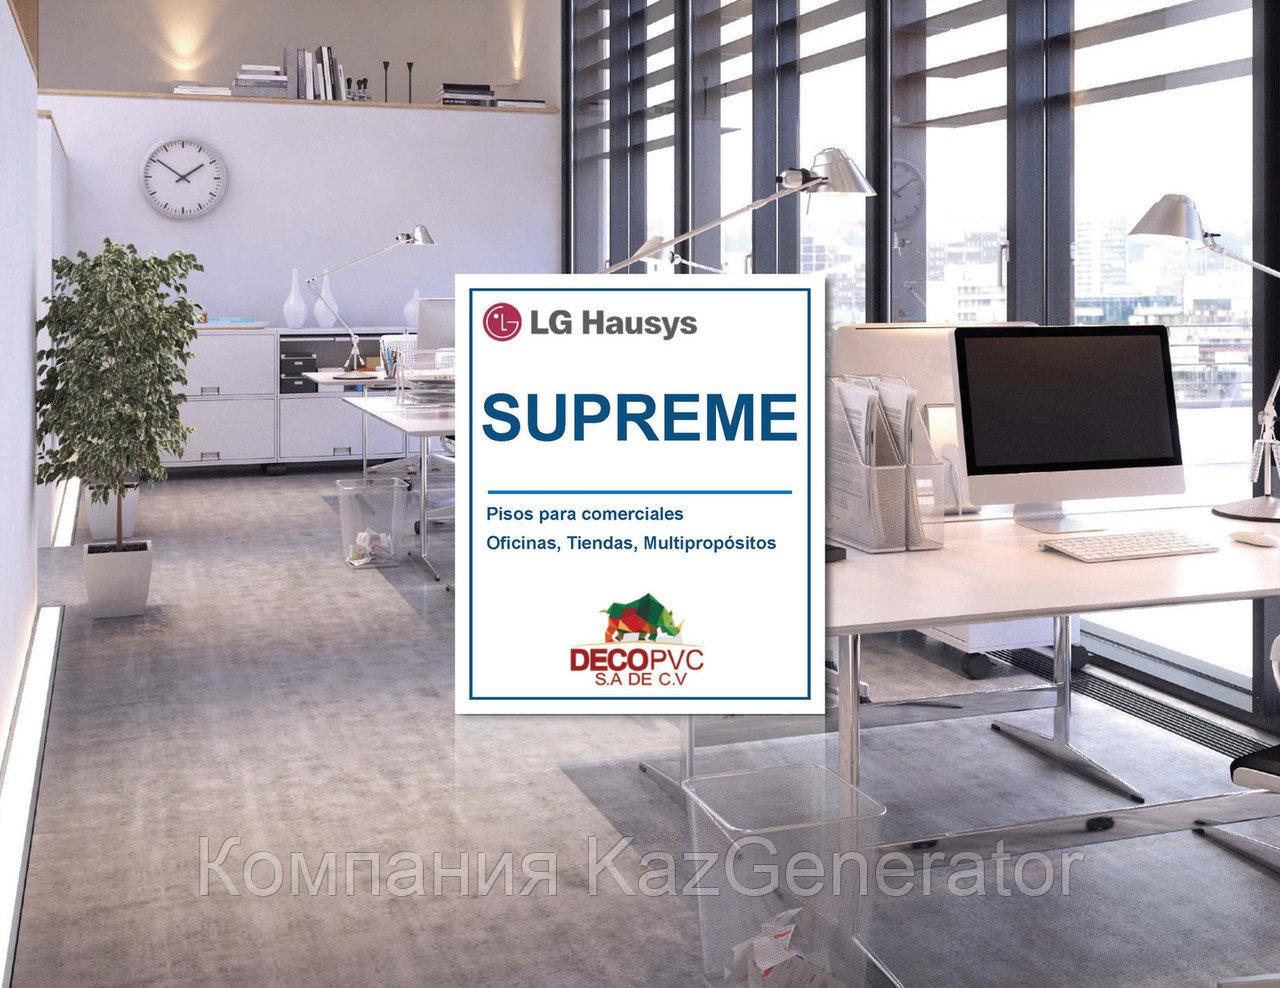 Коммерческий линолеум LG Hausys Supreme  2м х 20м